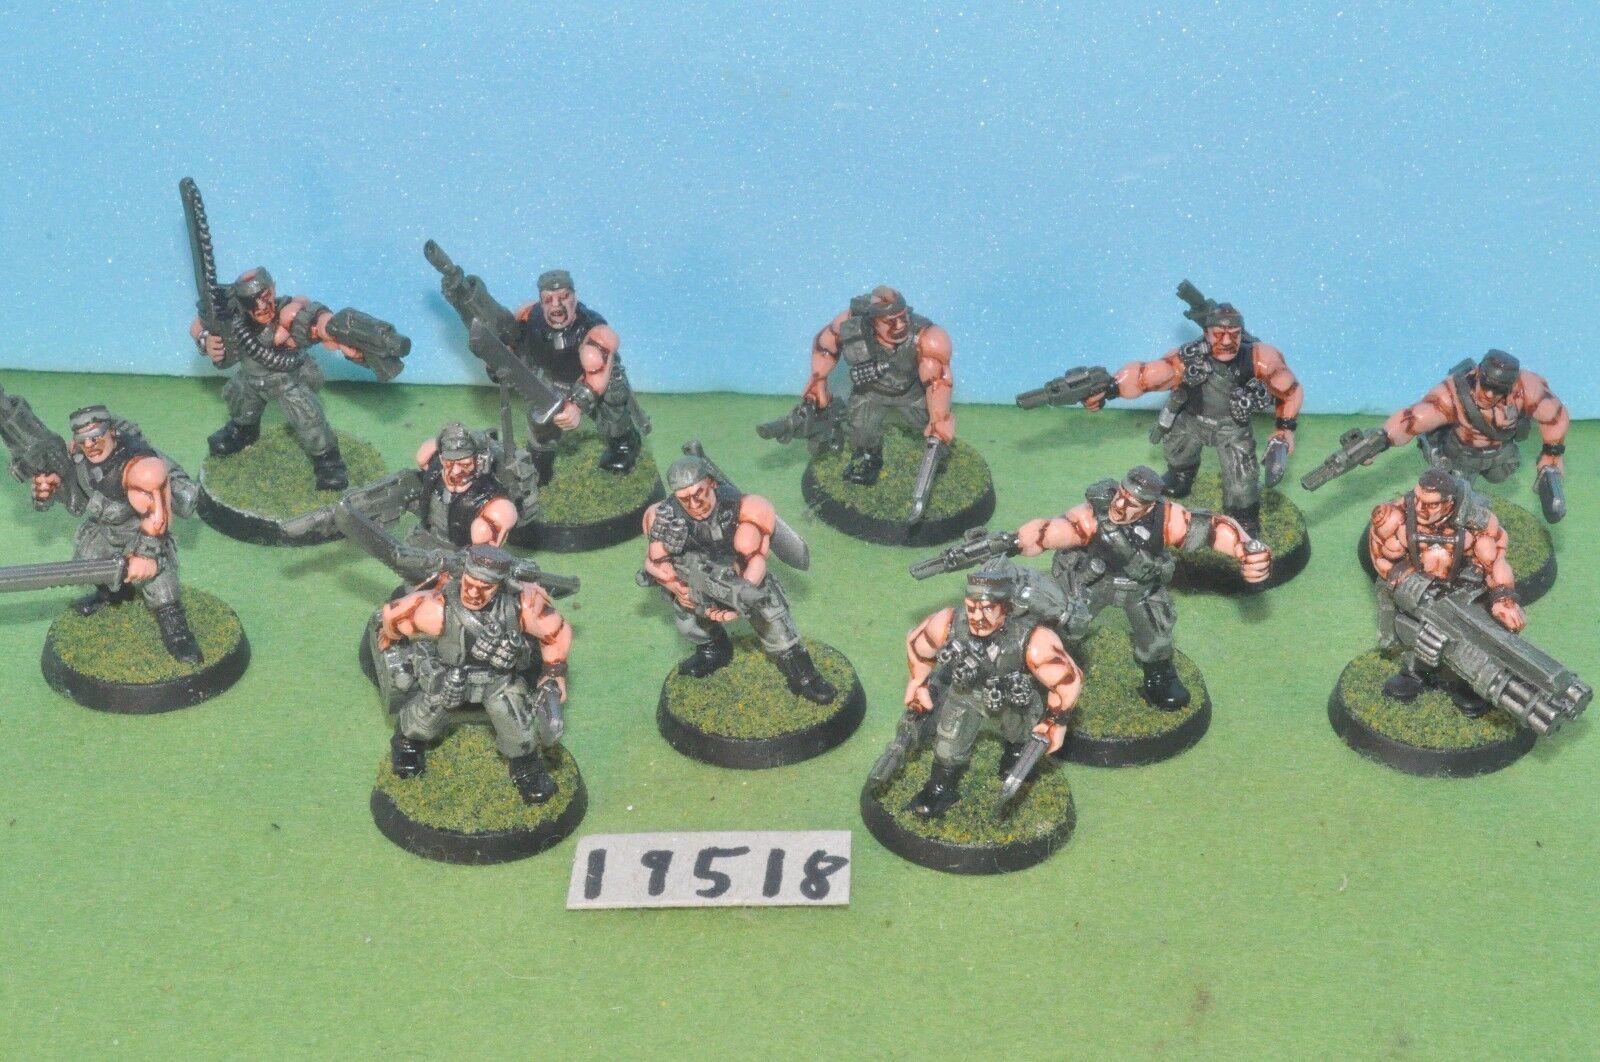 Item scifi   imperial guard - 12 catachan commandos 2 metal 40k - (19518)